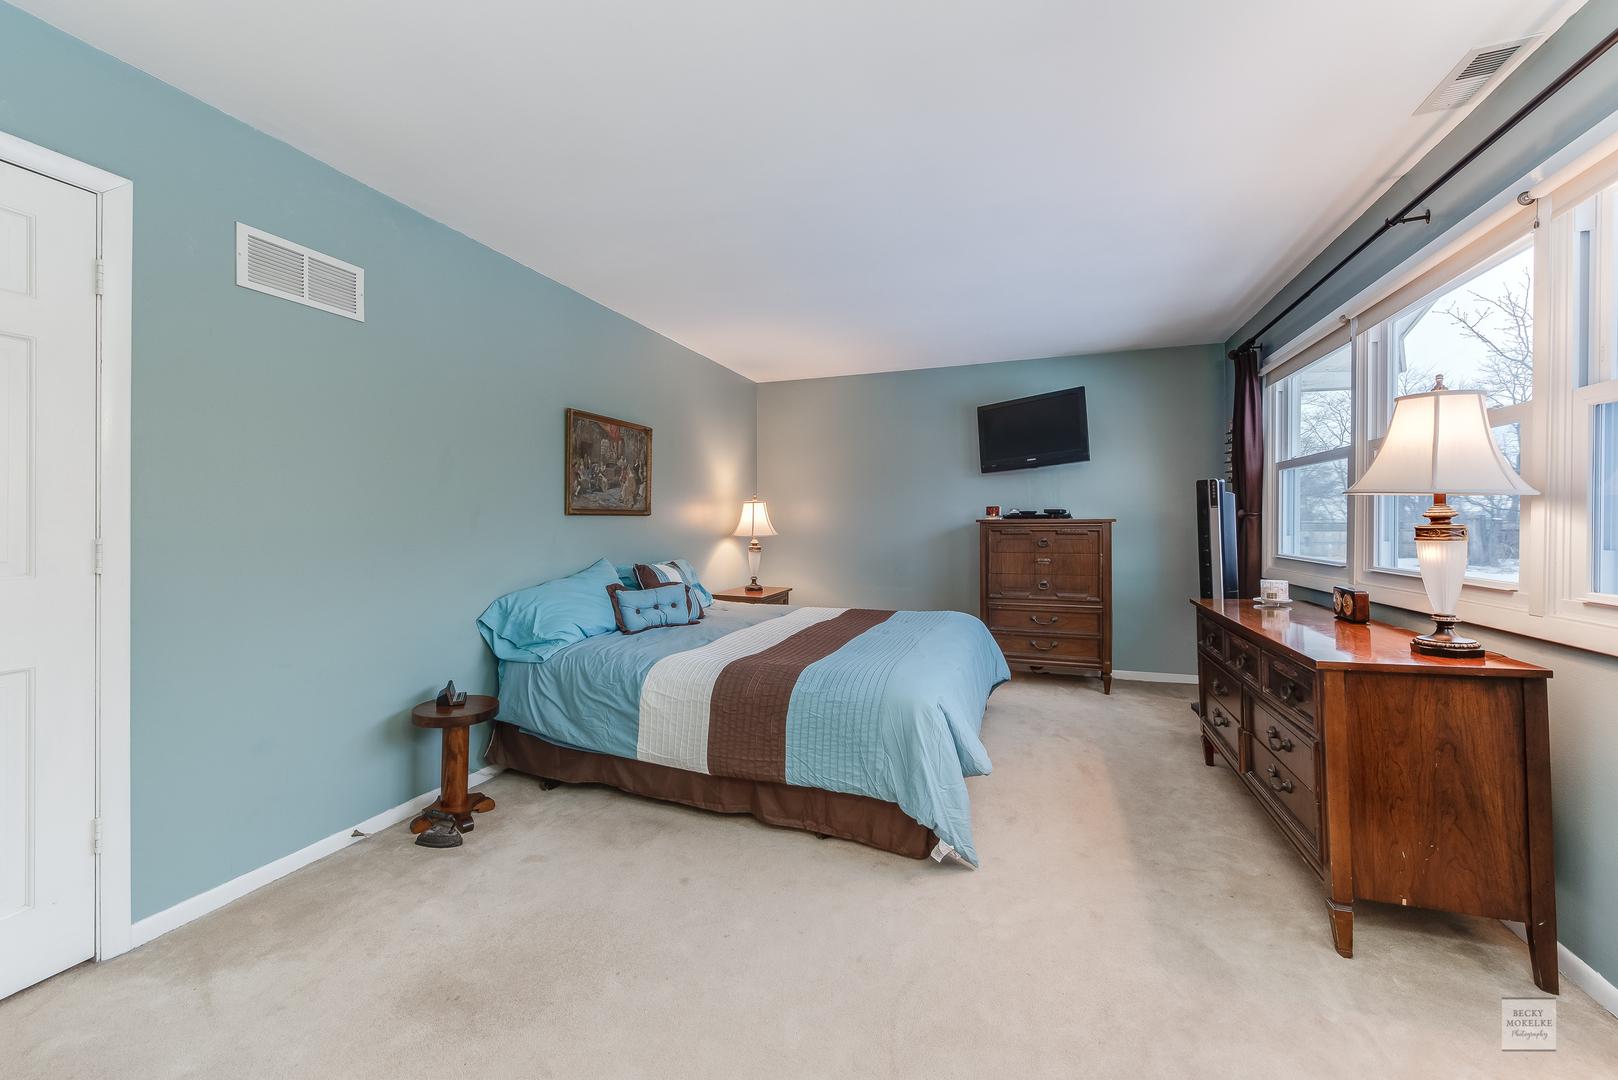 13 East Anchor, Oswego, Illinois, 60543